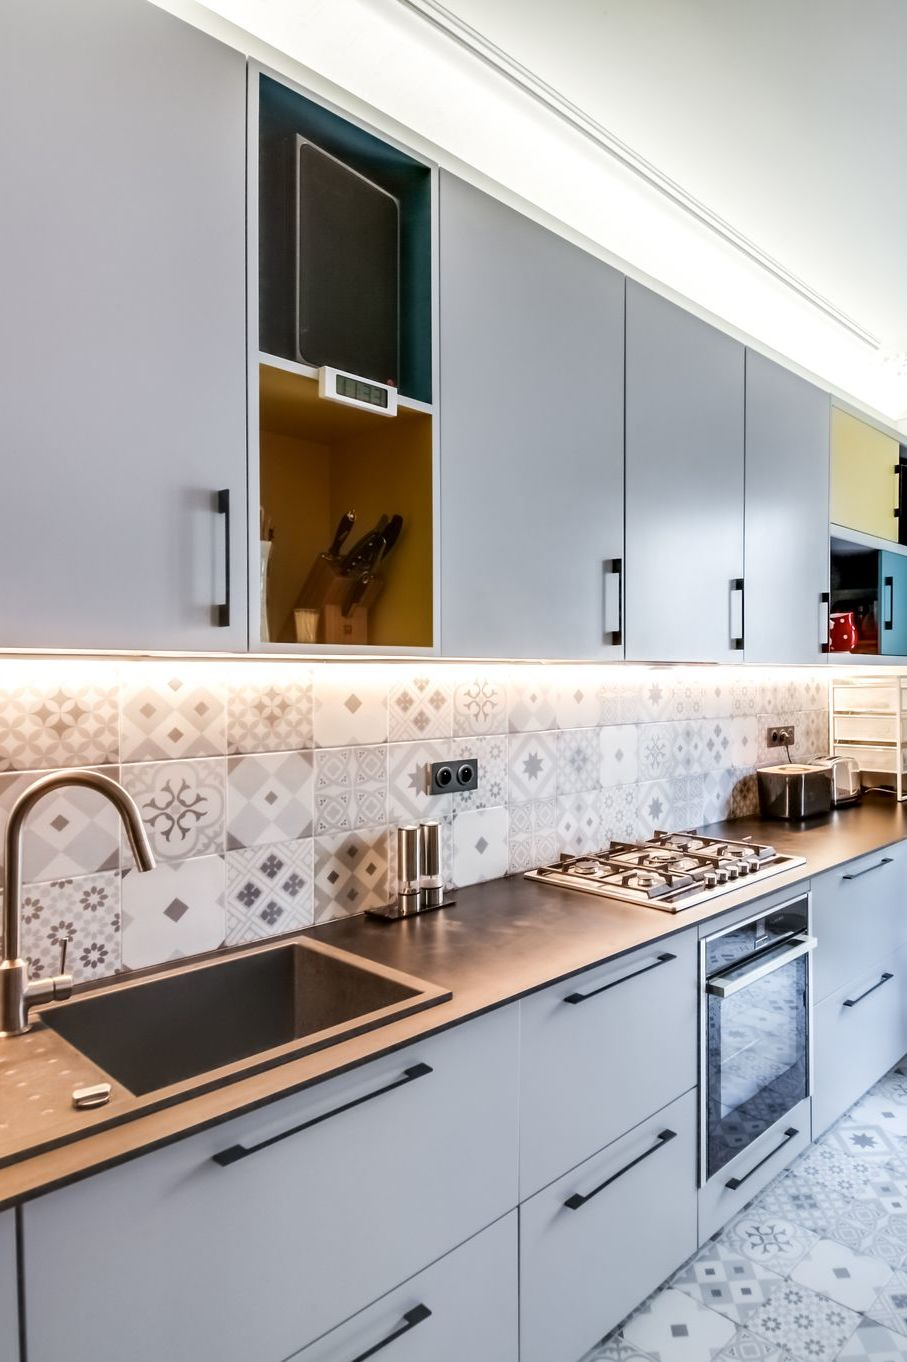 Cuisine Ikea Relookee Idees Pour La Personnaliser En 2020